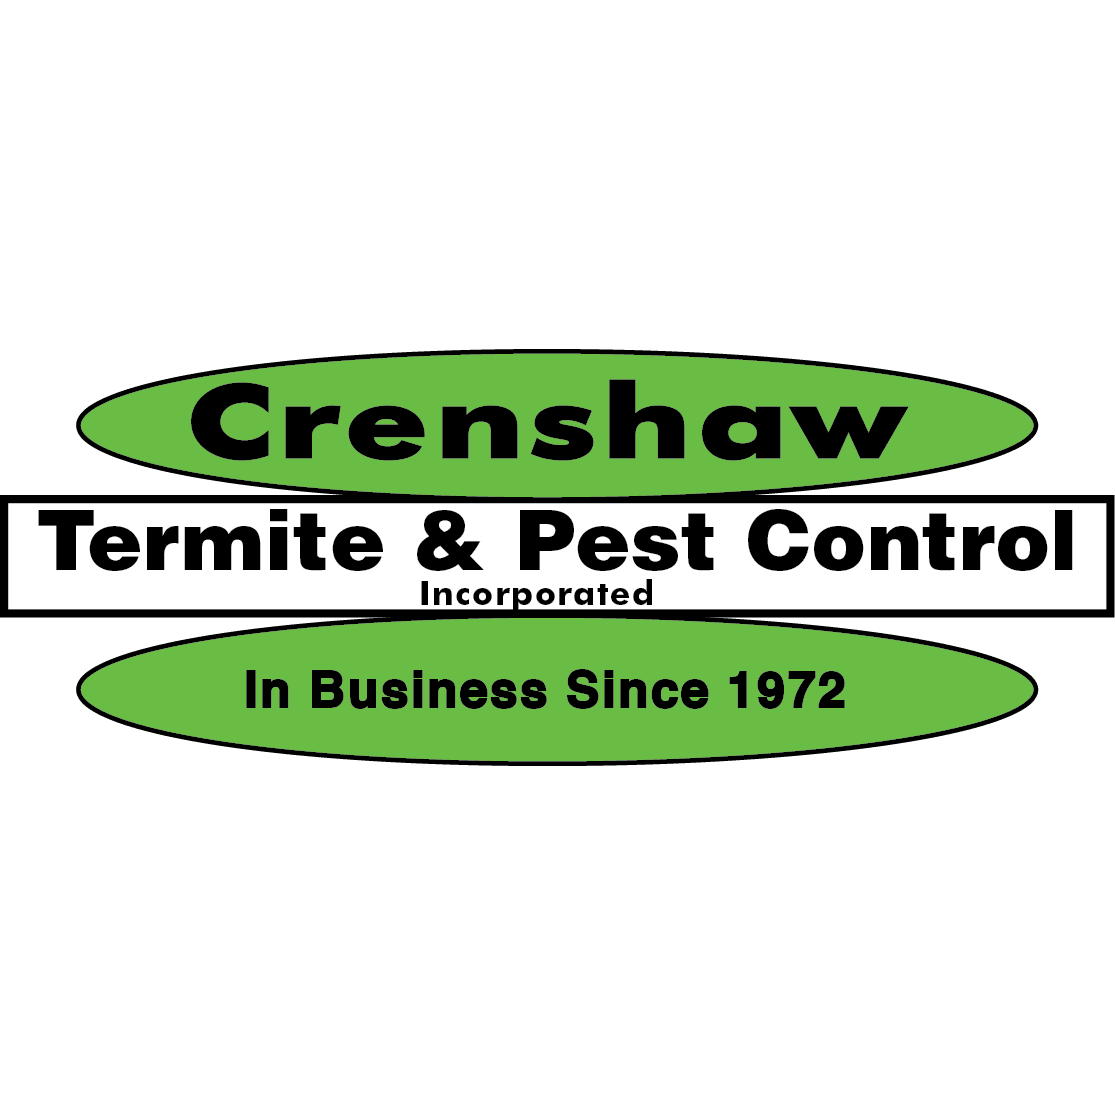 Crenshaw Termite &Pest Control